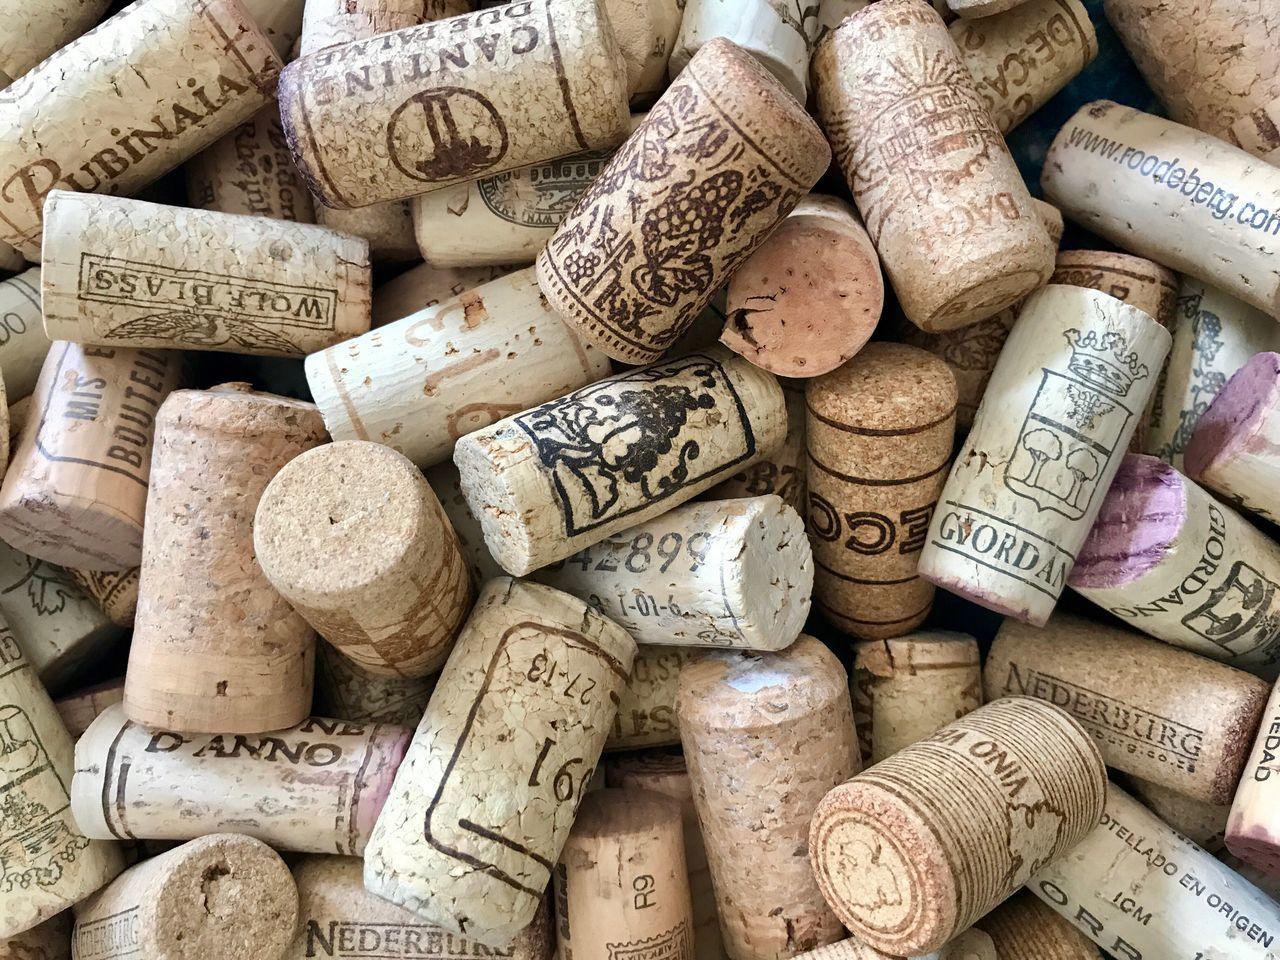 Wine Cork Cork - Stopper Wine Wine Bottle Backgrounds Full Frame Bottle Alcohol Textured  Winemaking No People Arrangement Winery Drink Close-up Vine - Plant Indoors  Wine Cask Day Winetasting